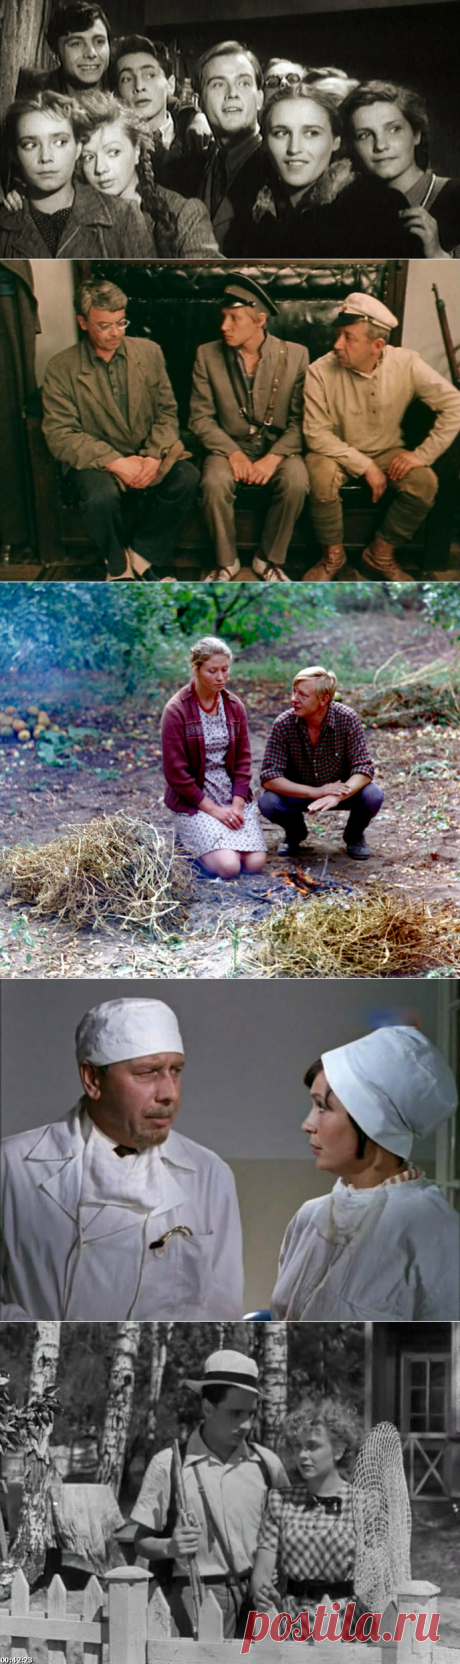 Тест по советским фильмам | Шепот дождя | Яндекс Дзен